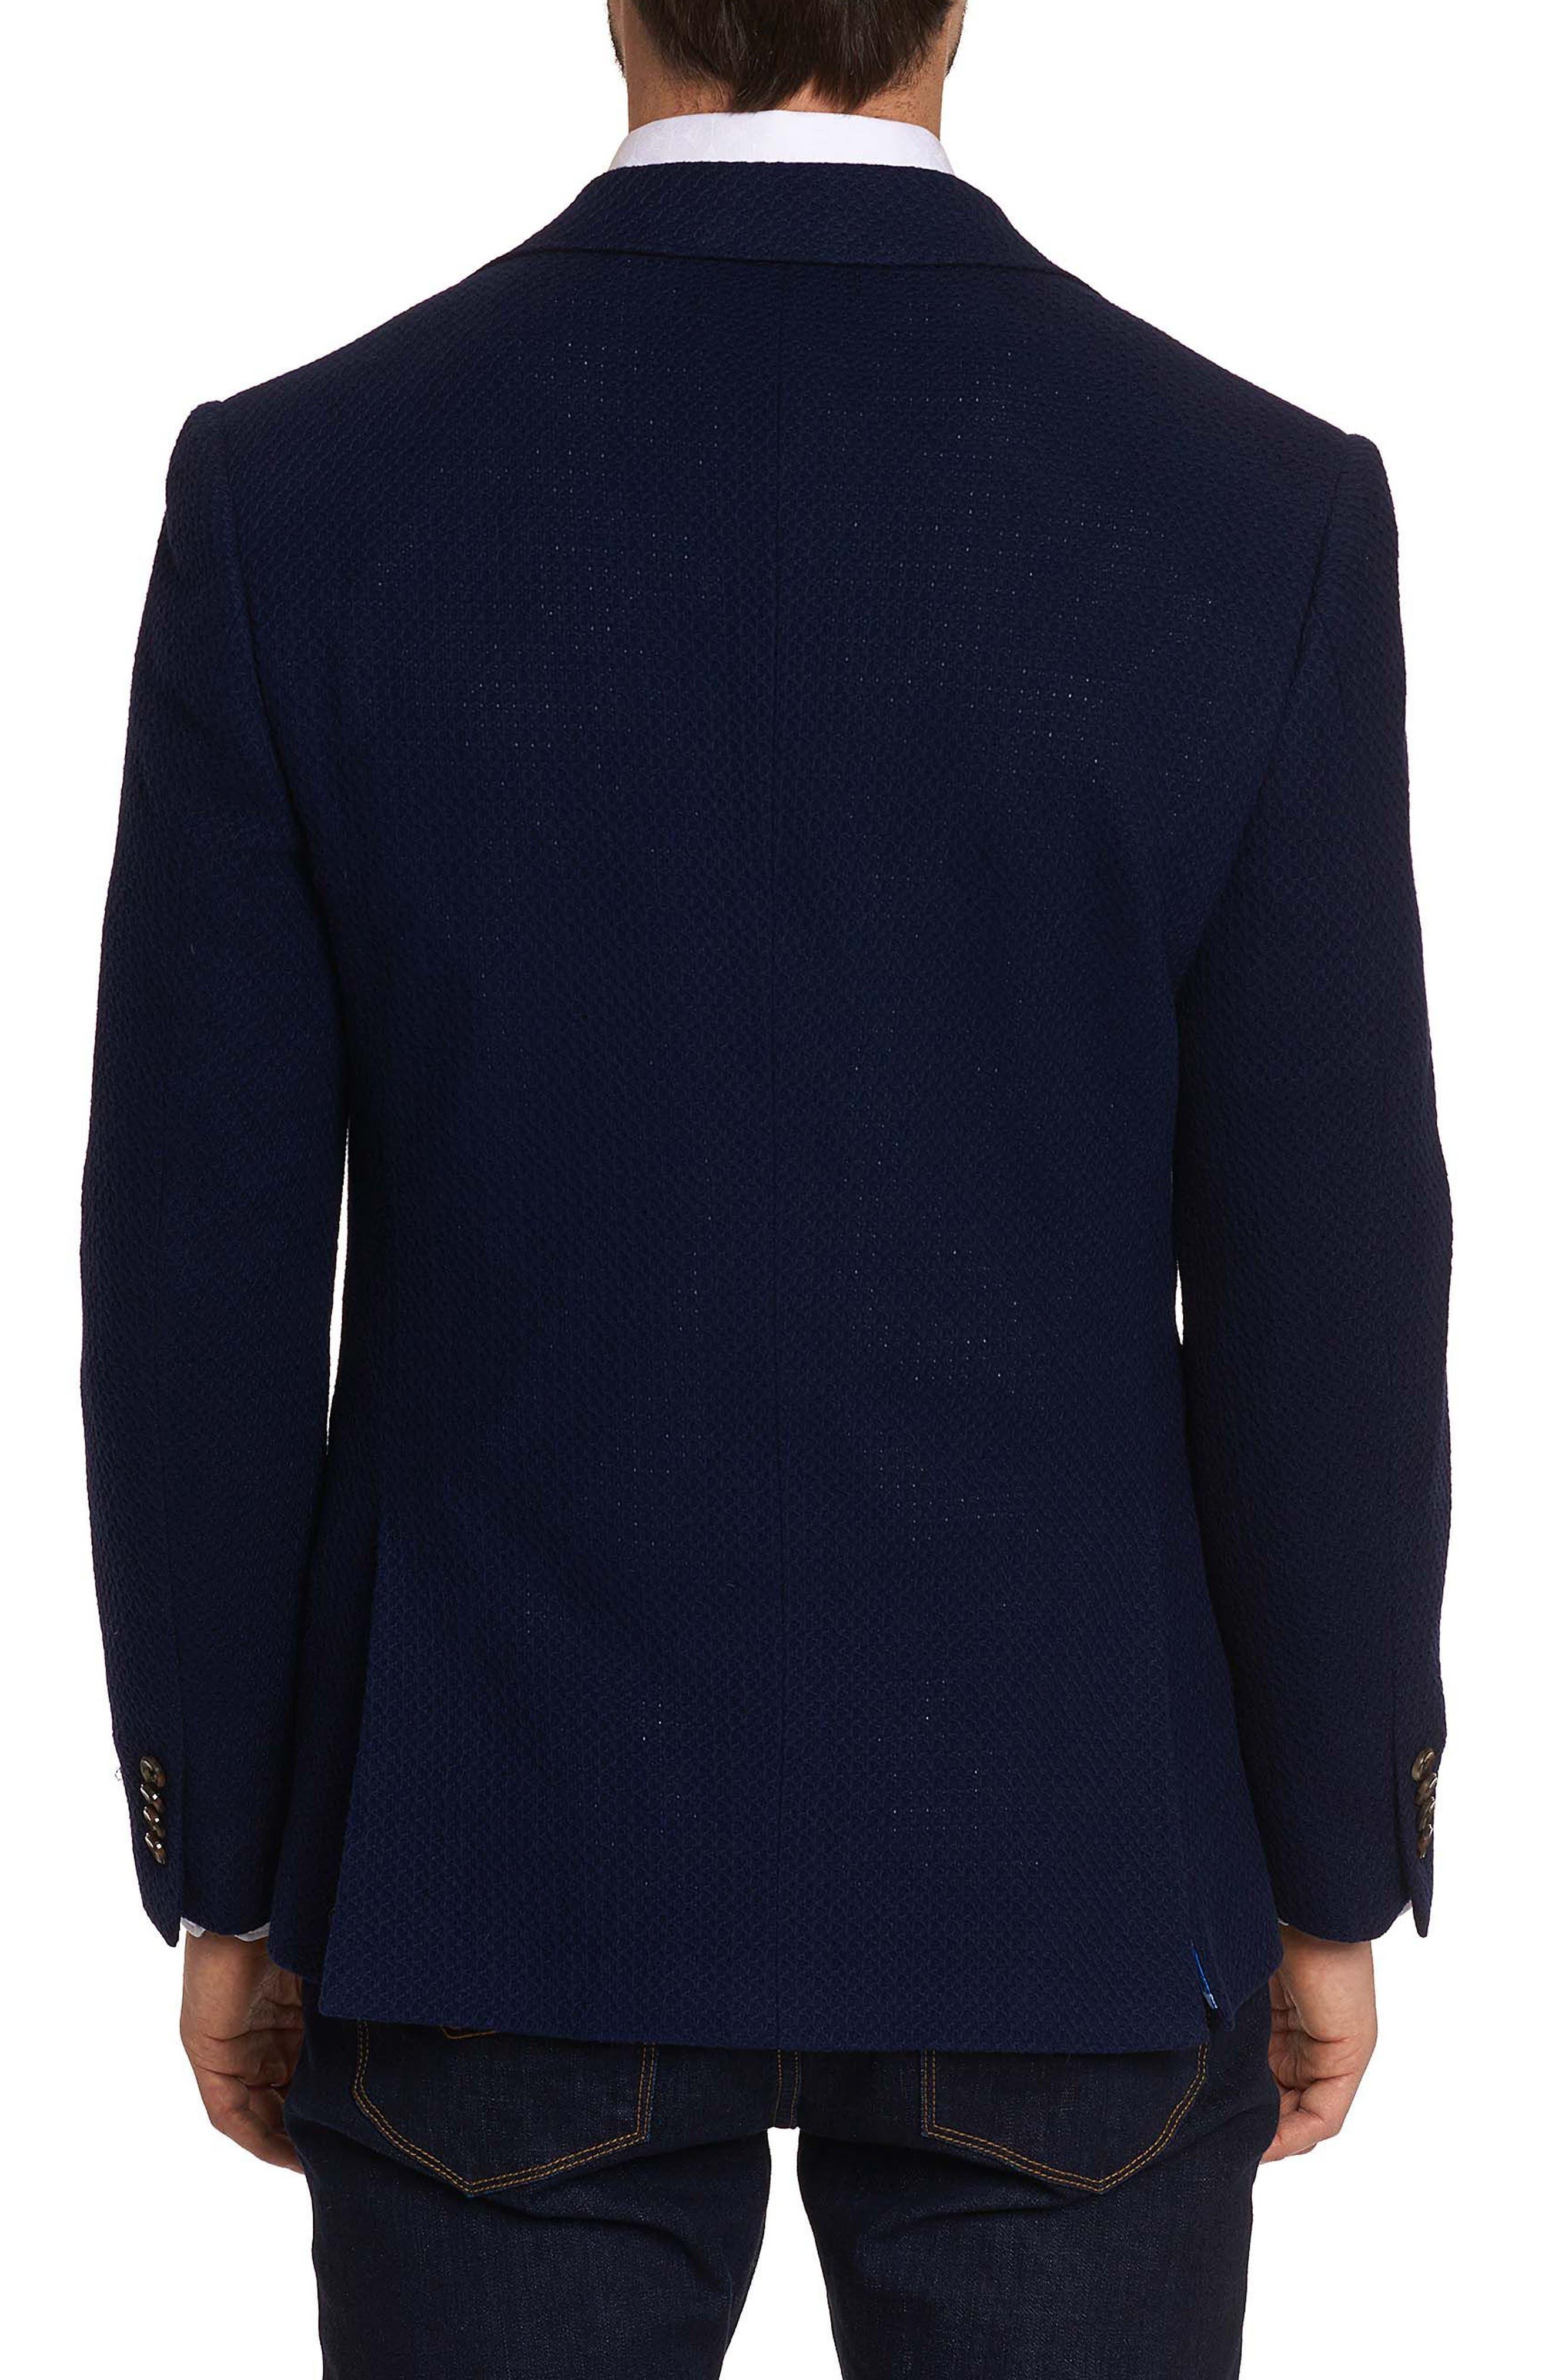 Lauros Woven Sport Coat,                             Alternate thumbnail 2, color,                             Navy